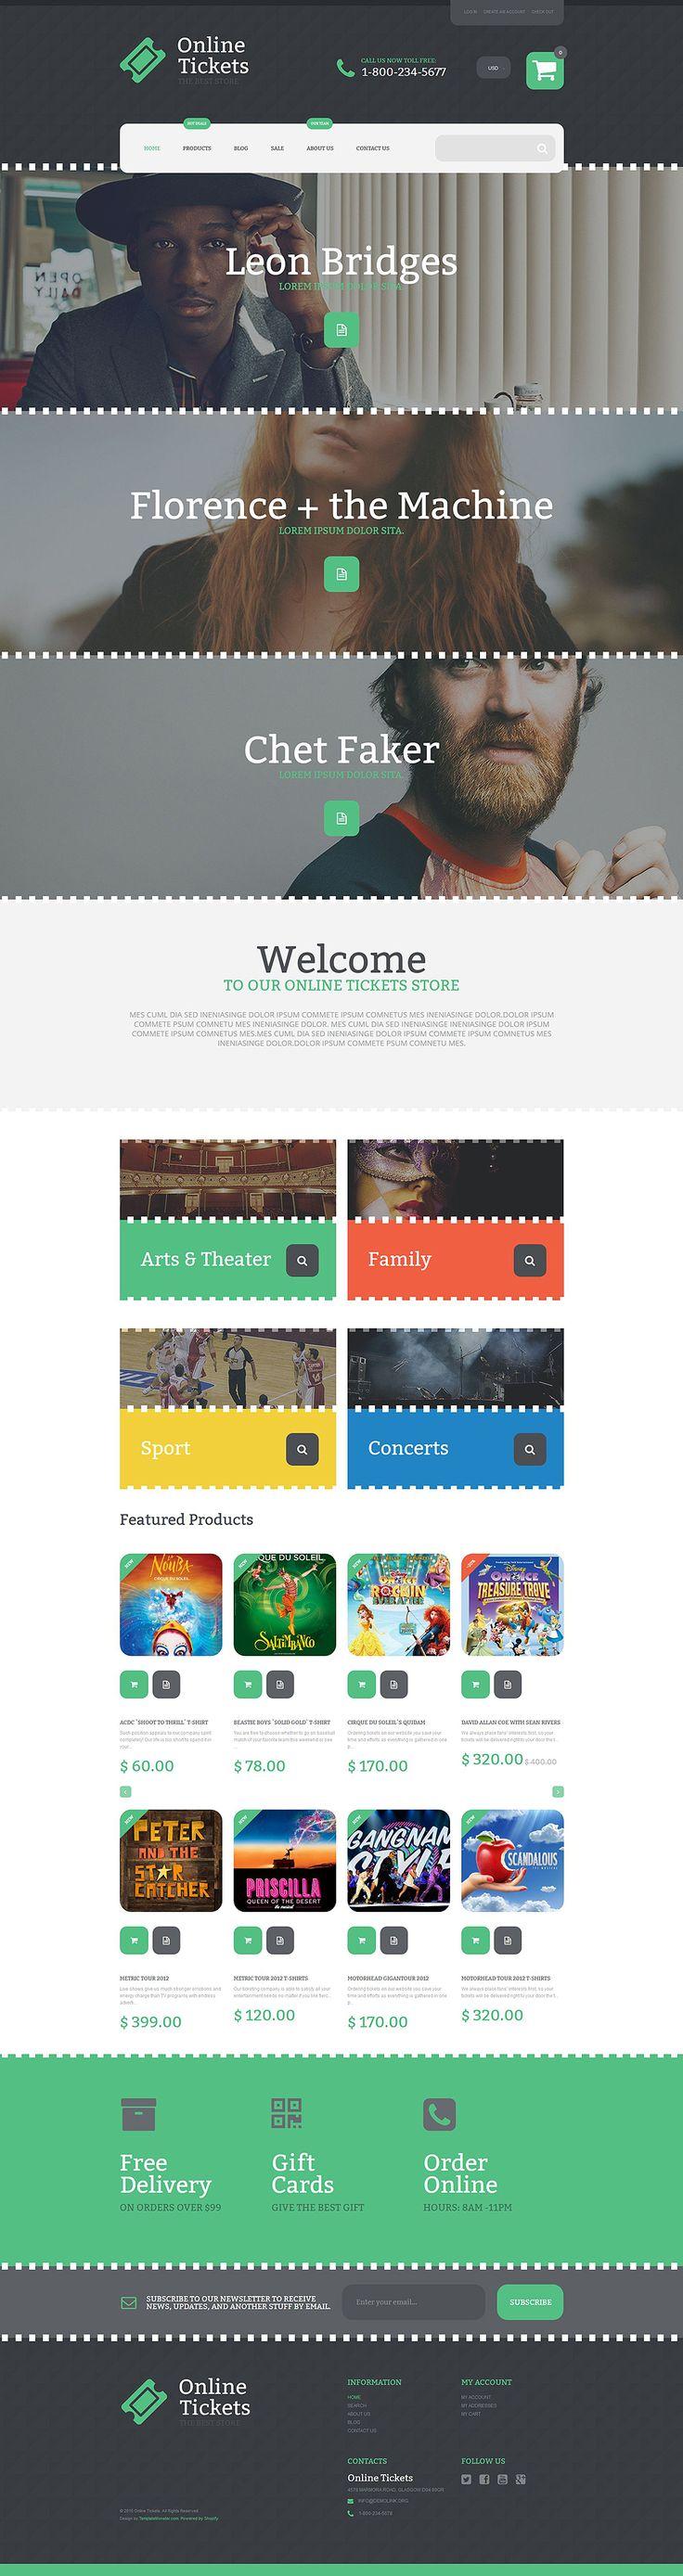 51 best Joomla Templates images on Pinterest